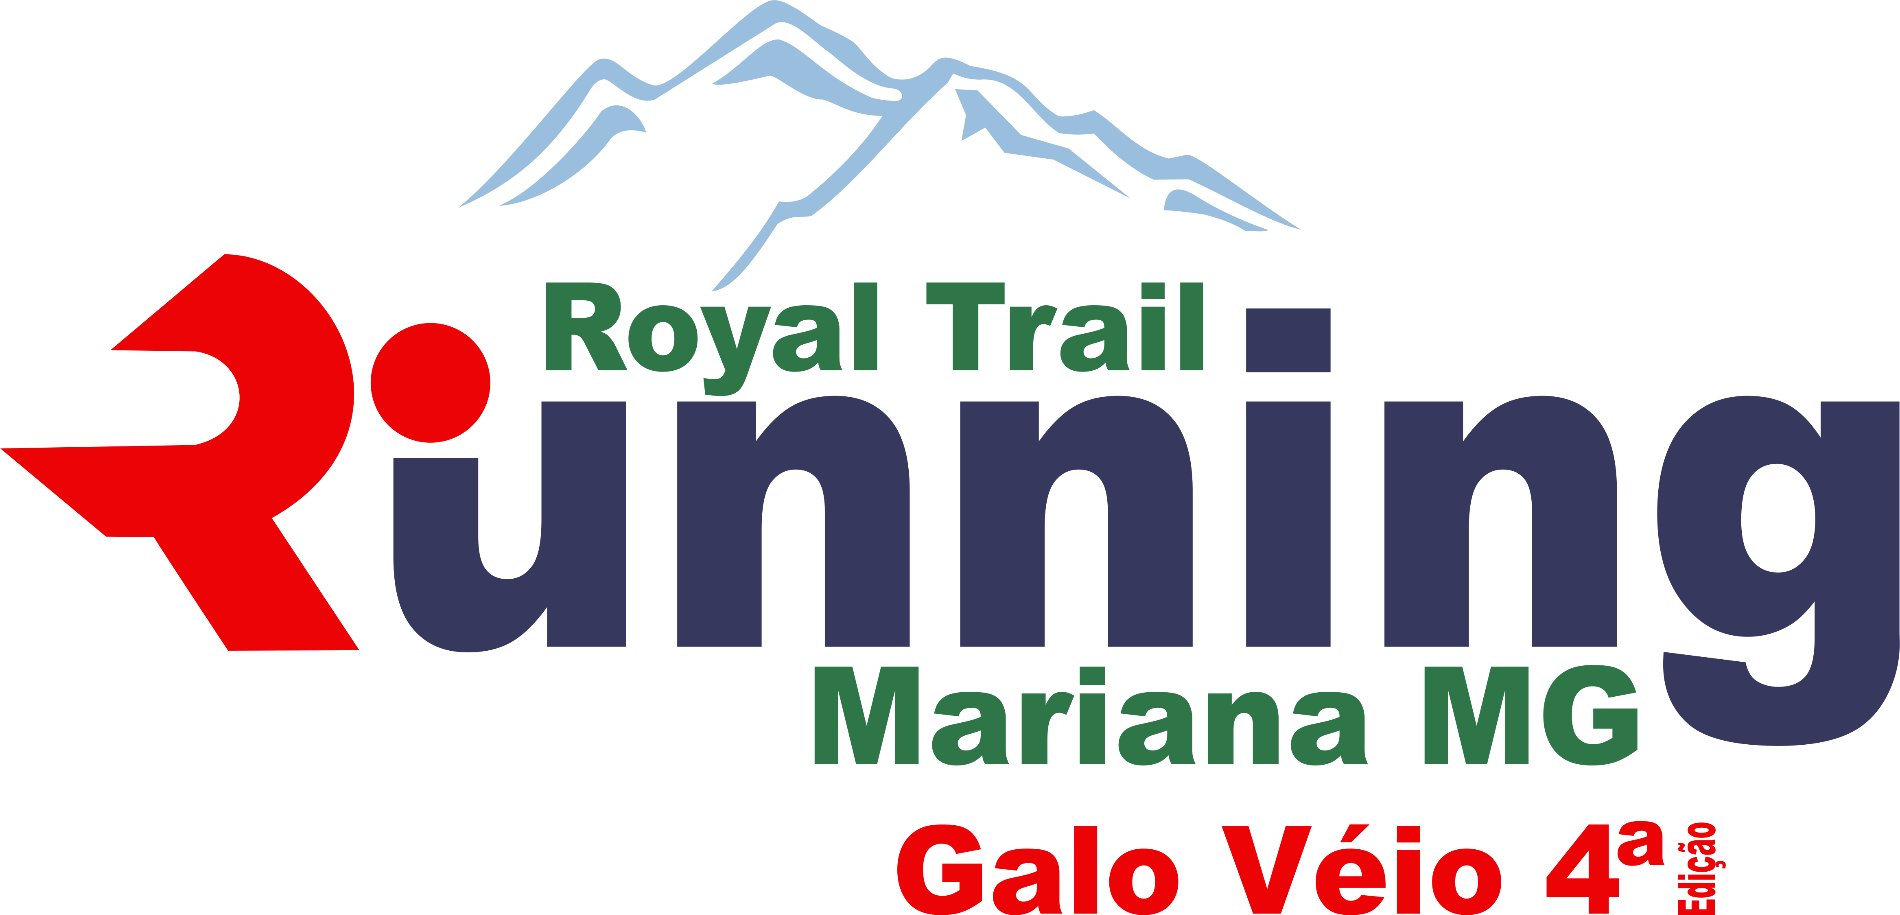 Royal Trail Running Galo Veio - Imagem de topo